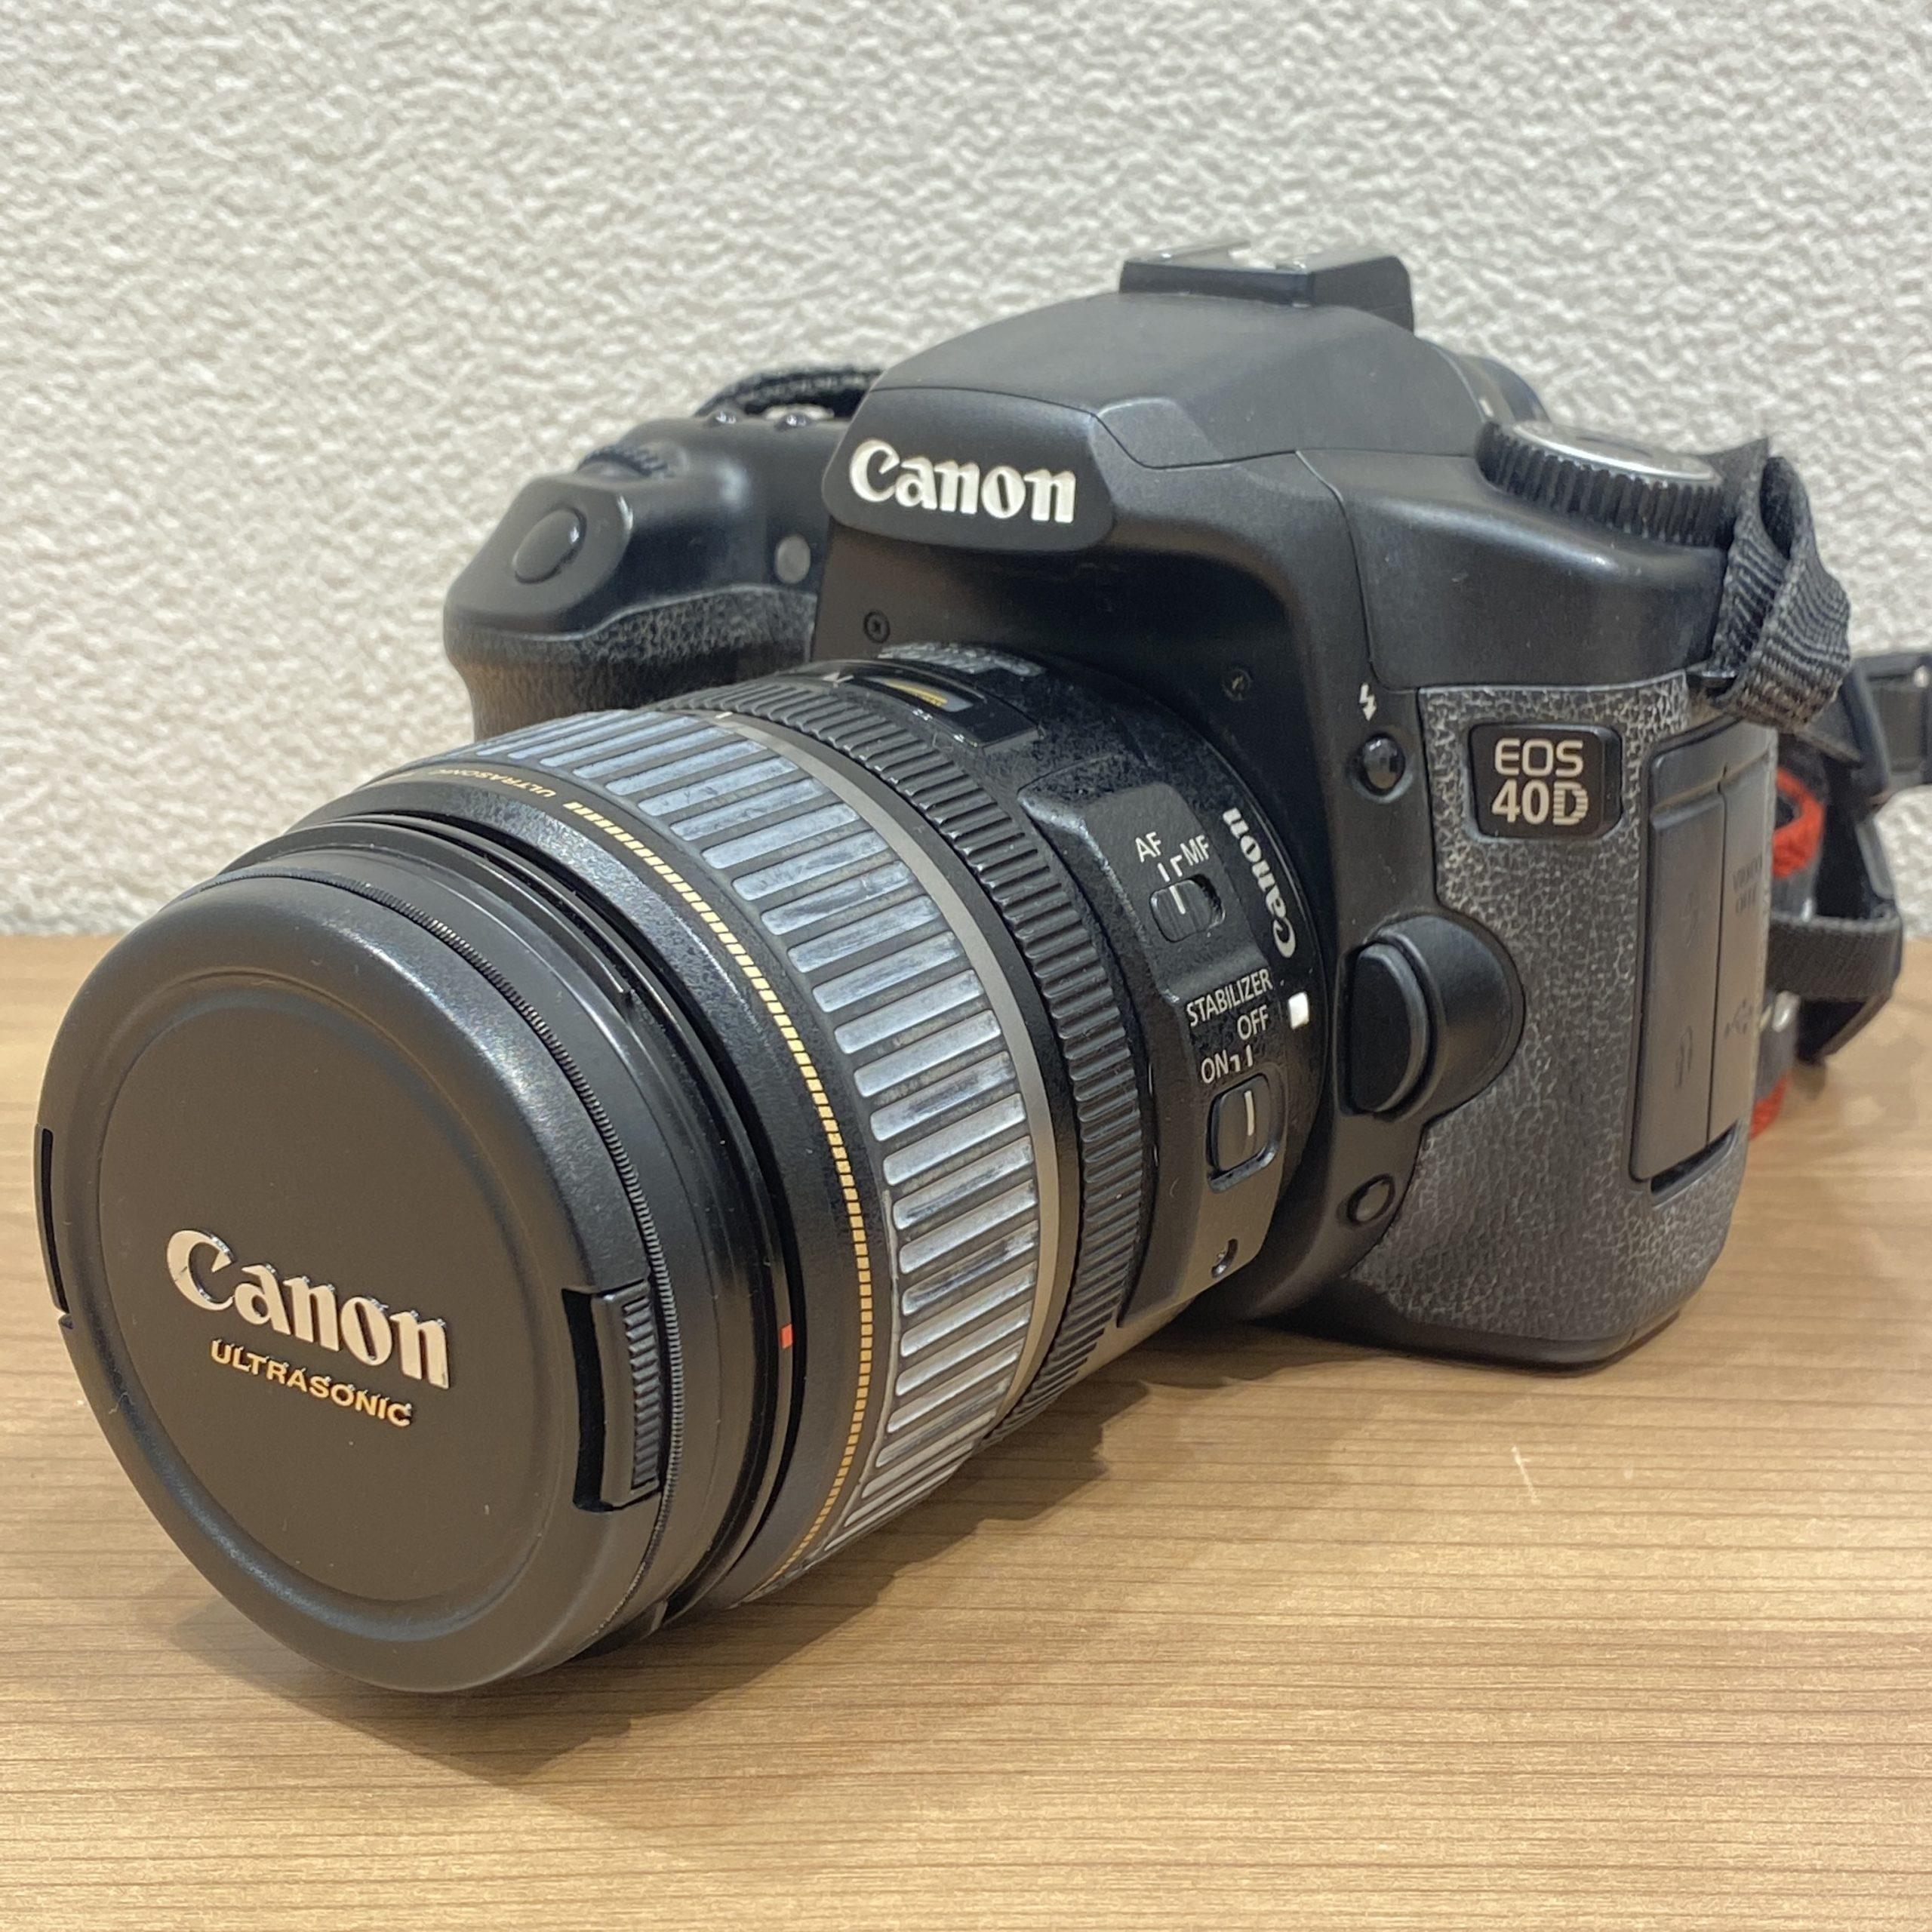 【Canon/キャノン】カメラボディ 40D 一眼レフカメラ